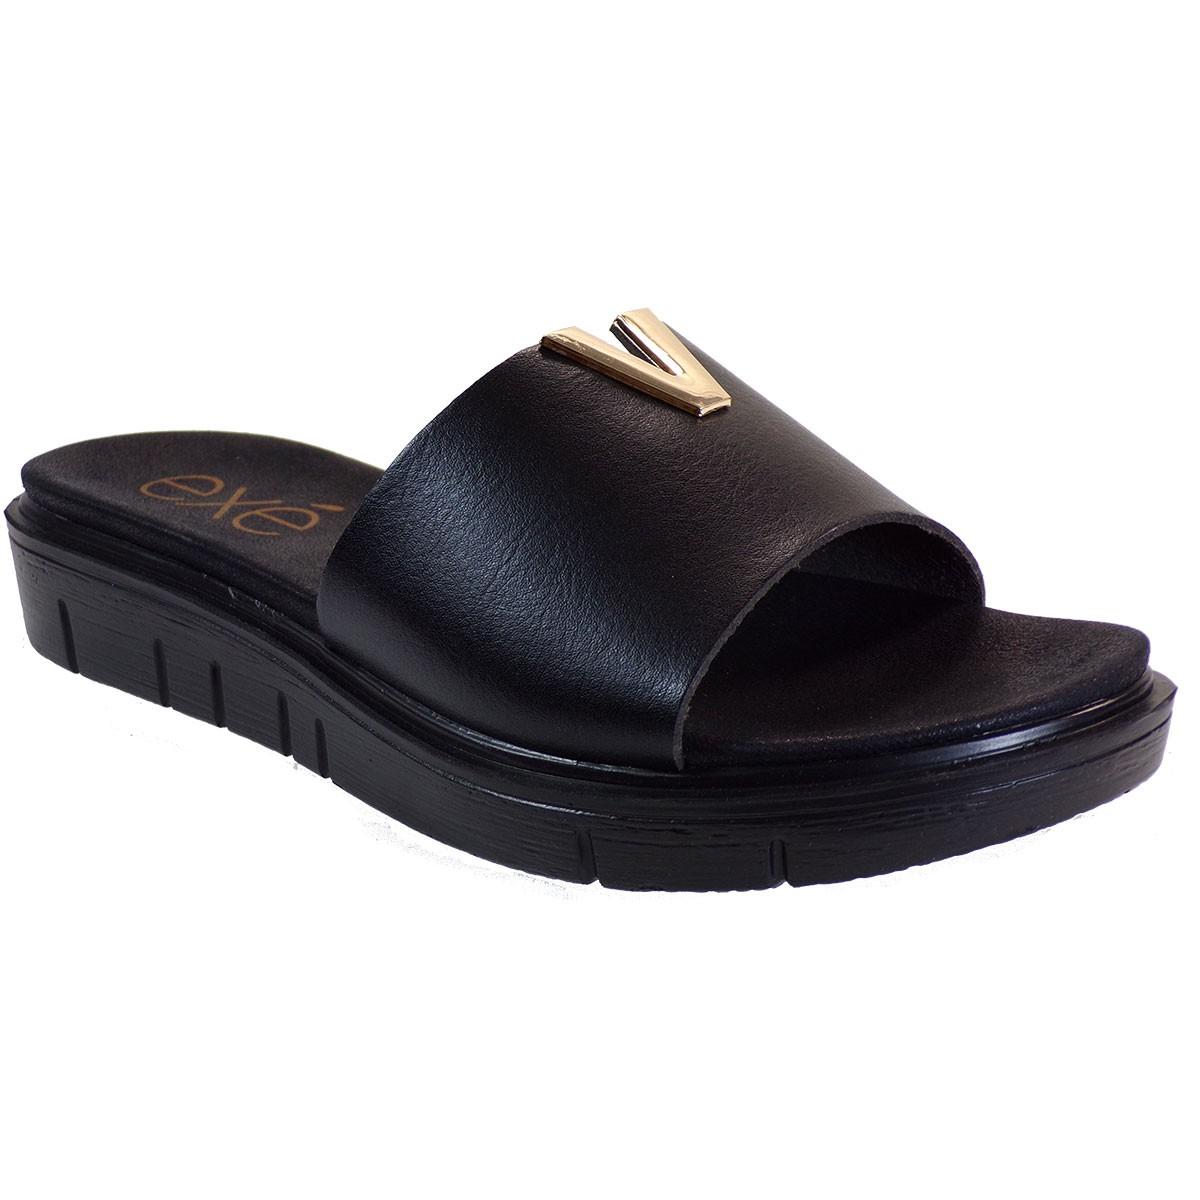 EXE Shoes Γυναικεία Παντόφλας 364-BZD86936 Μαύρο M489Q364200105